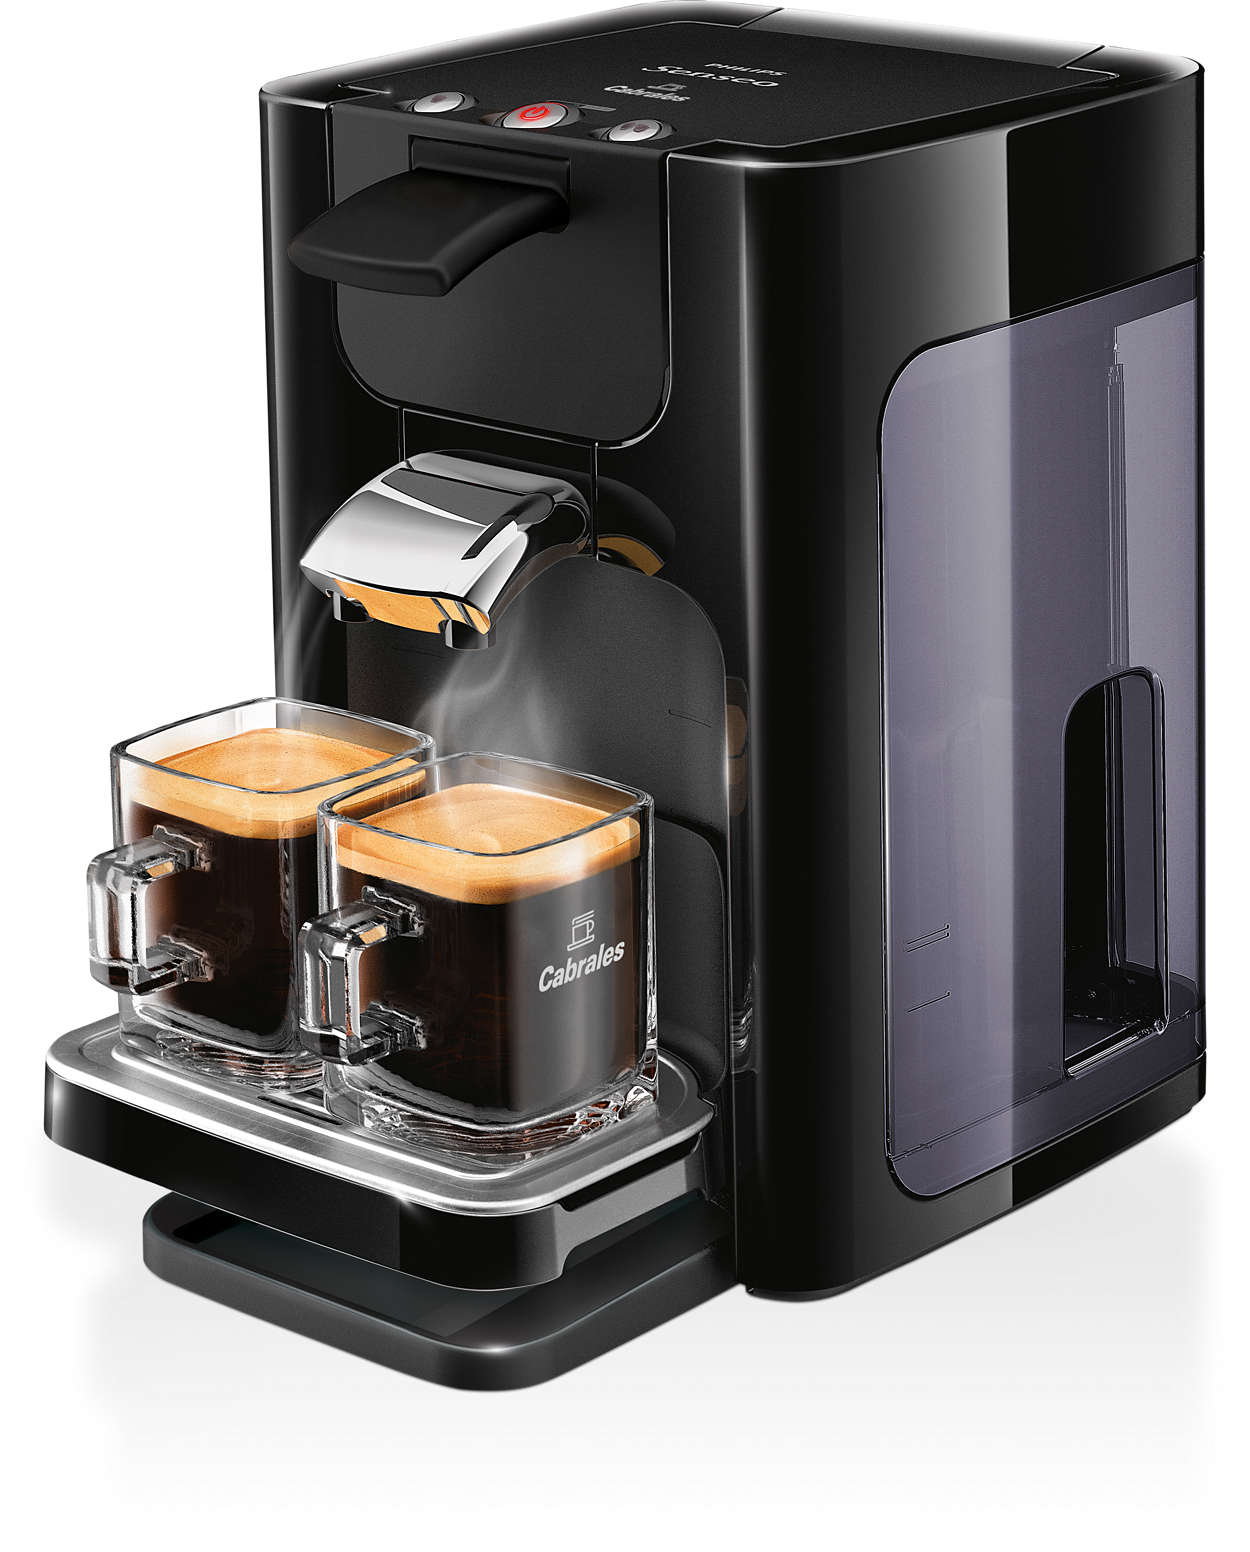 Sensacional café recién hecho.